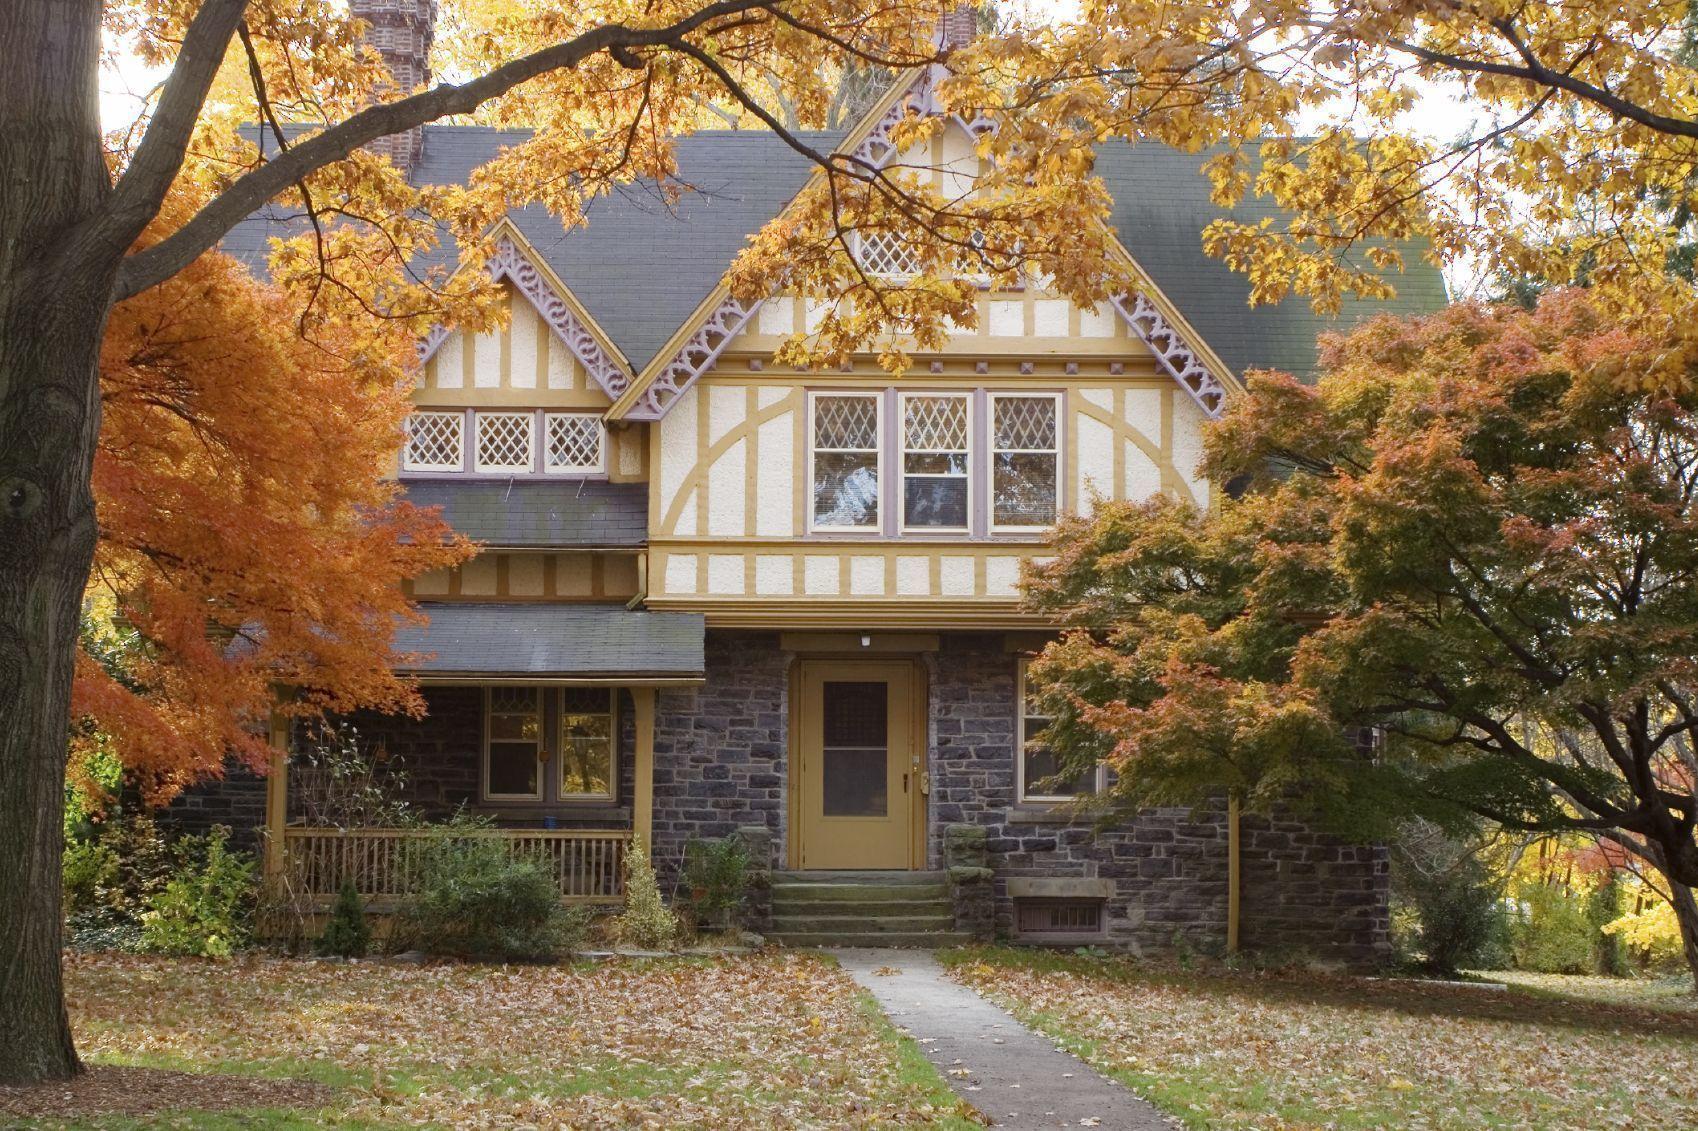 Suburban_house_autumn1